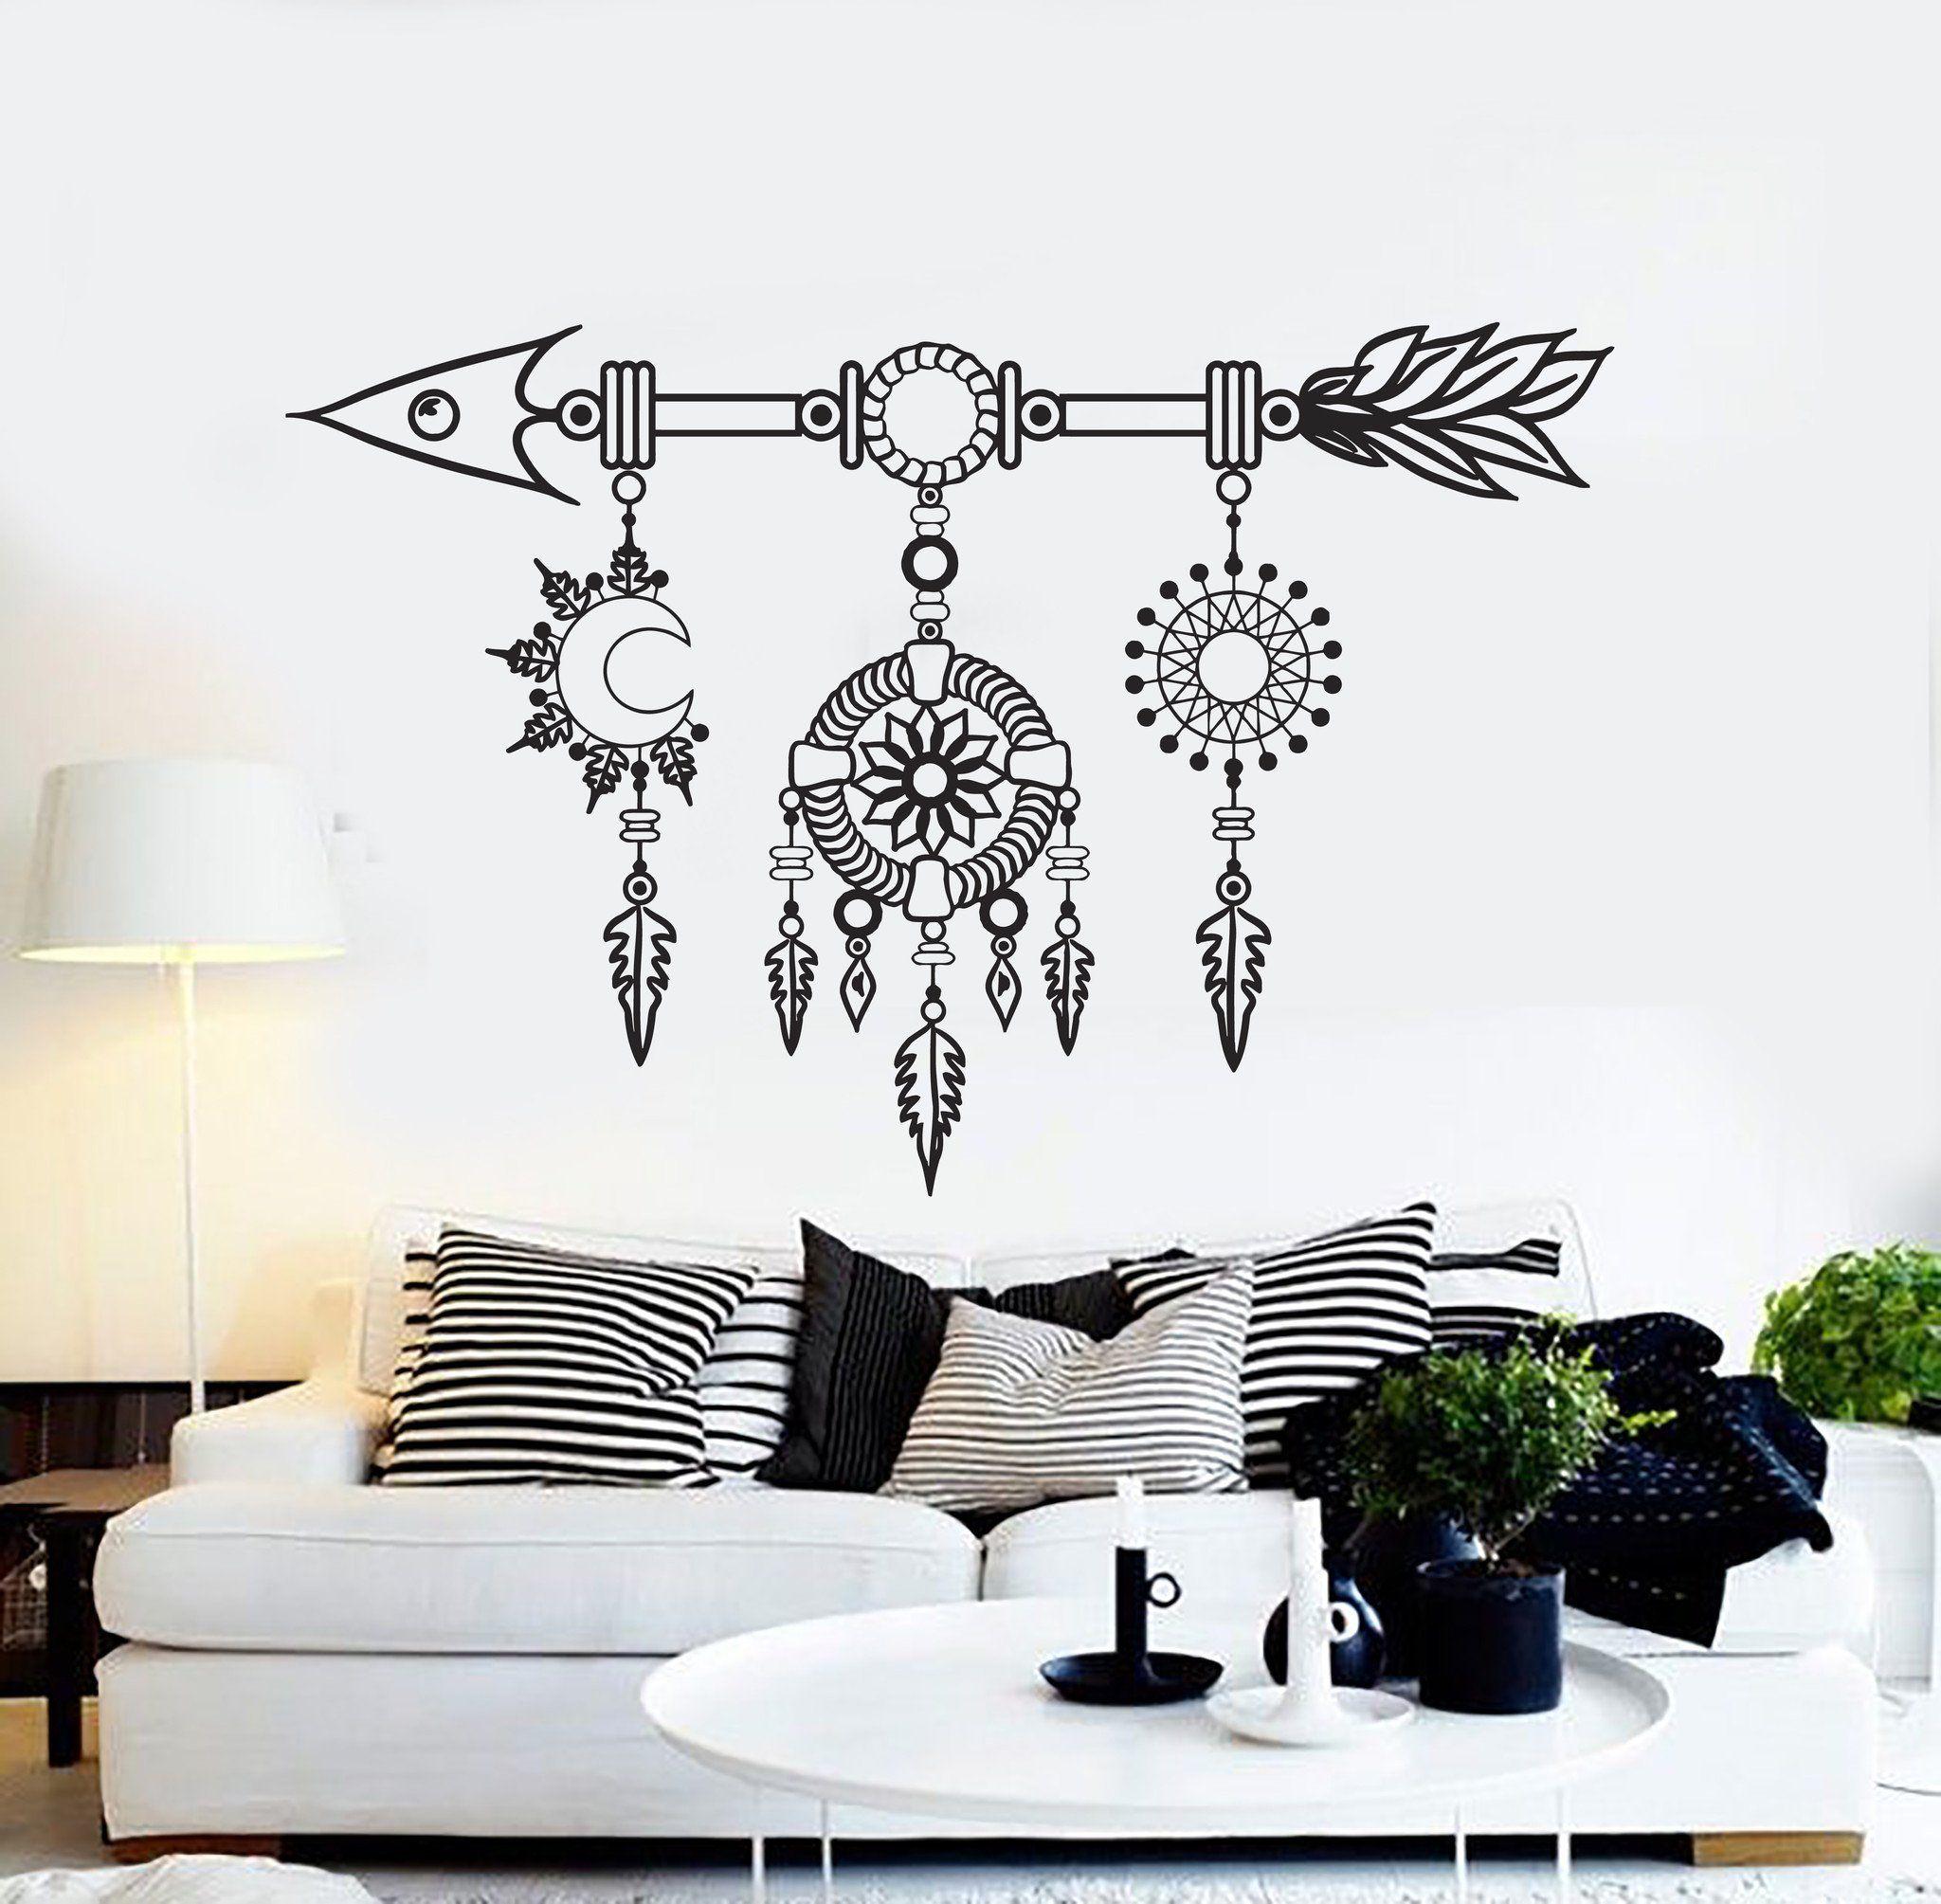 Handmade  Tribal Dream Catchers Wall  Decorations  6Pc Lot NpDc135T Z